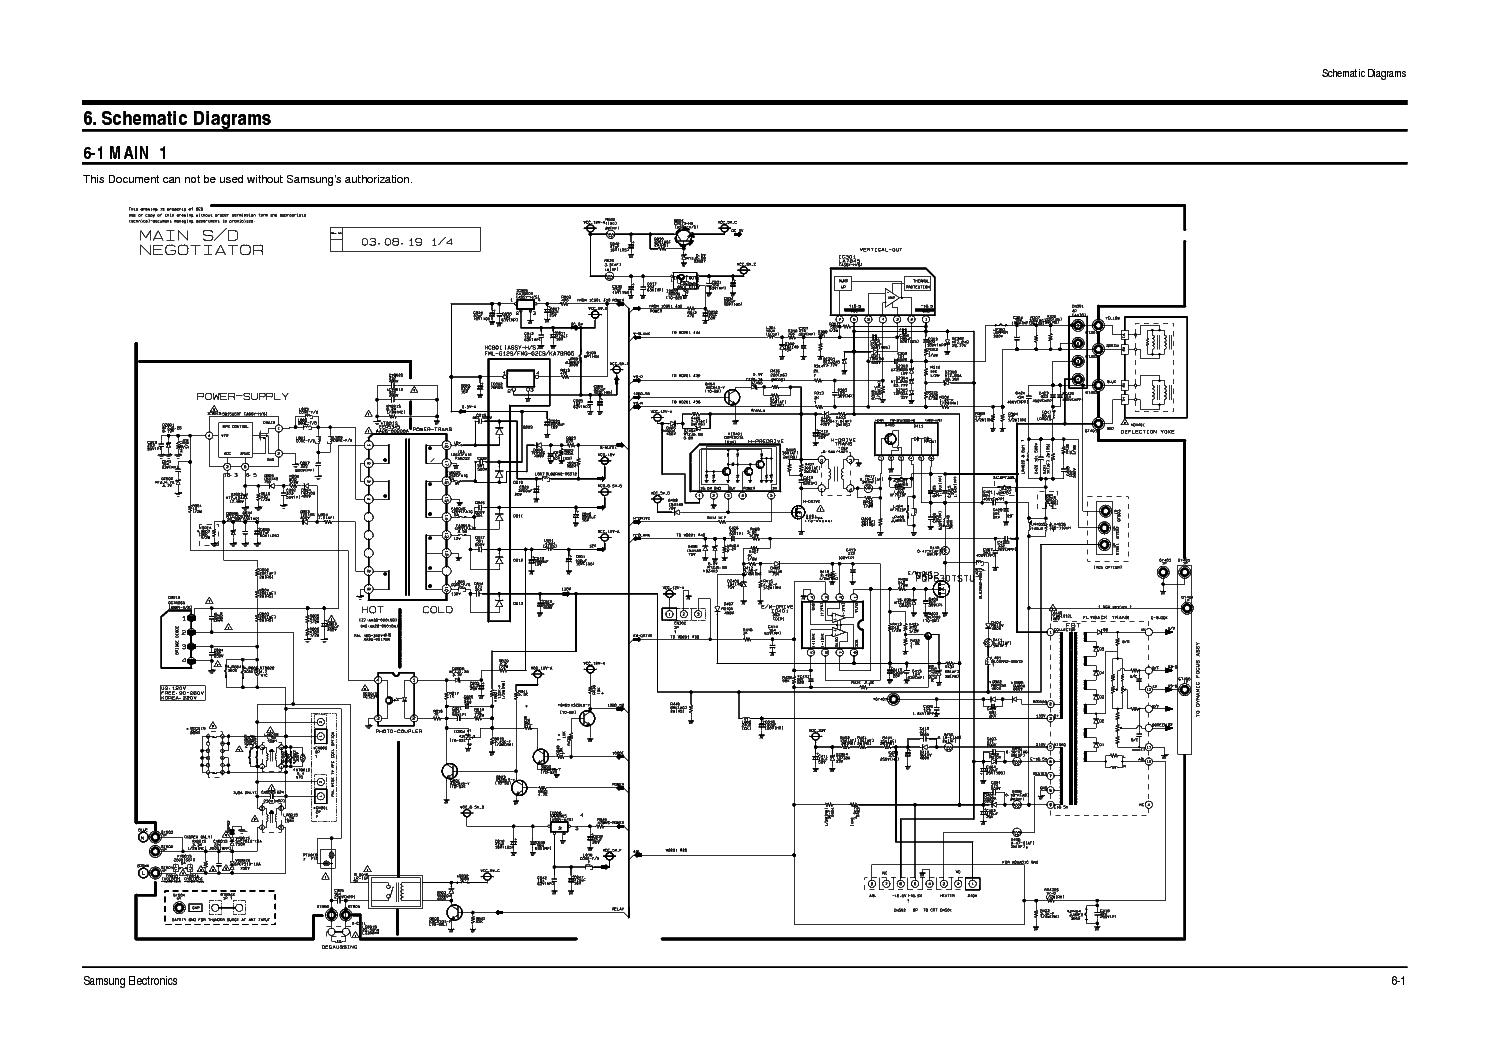 cubase 6 manual pdf download